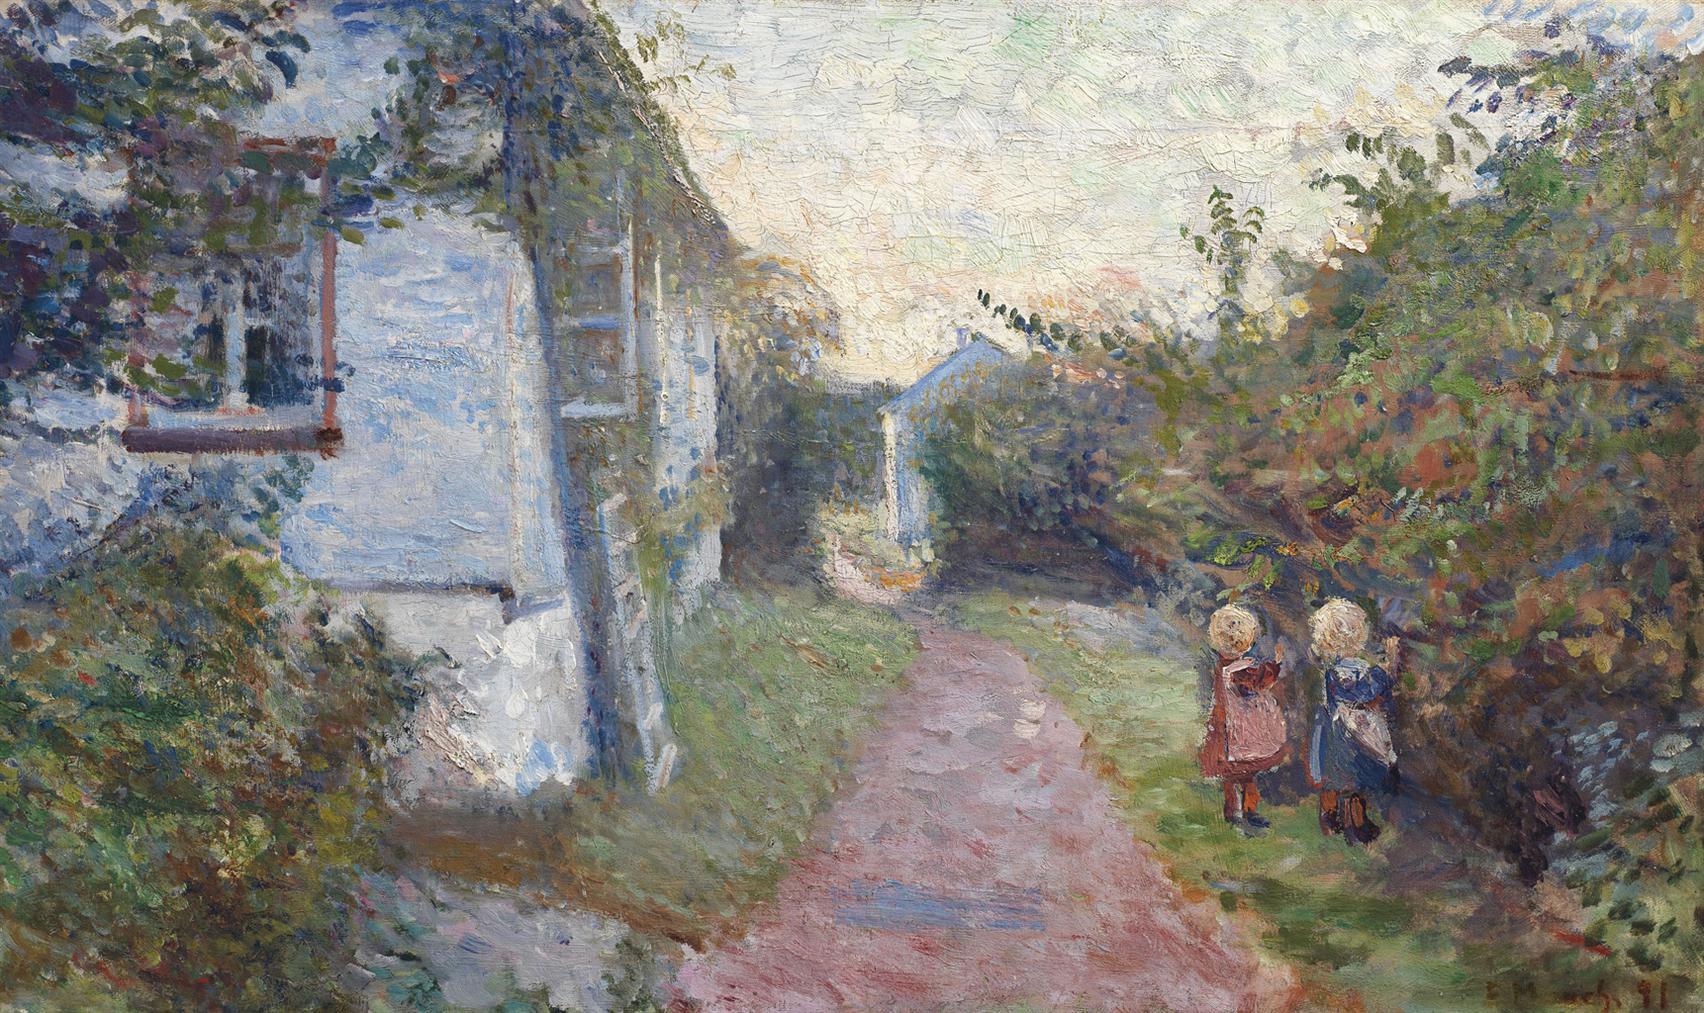 Edvard Munch-Sommeraften I Asgardstrand-1891